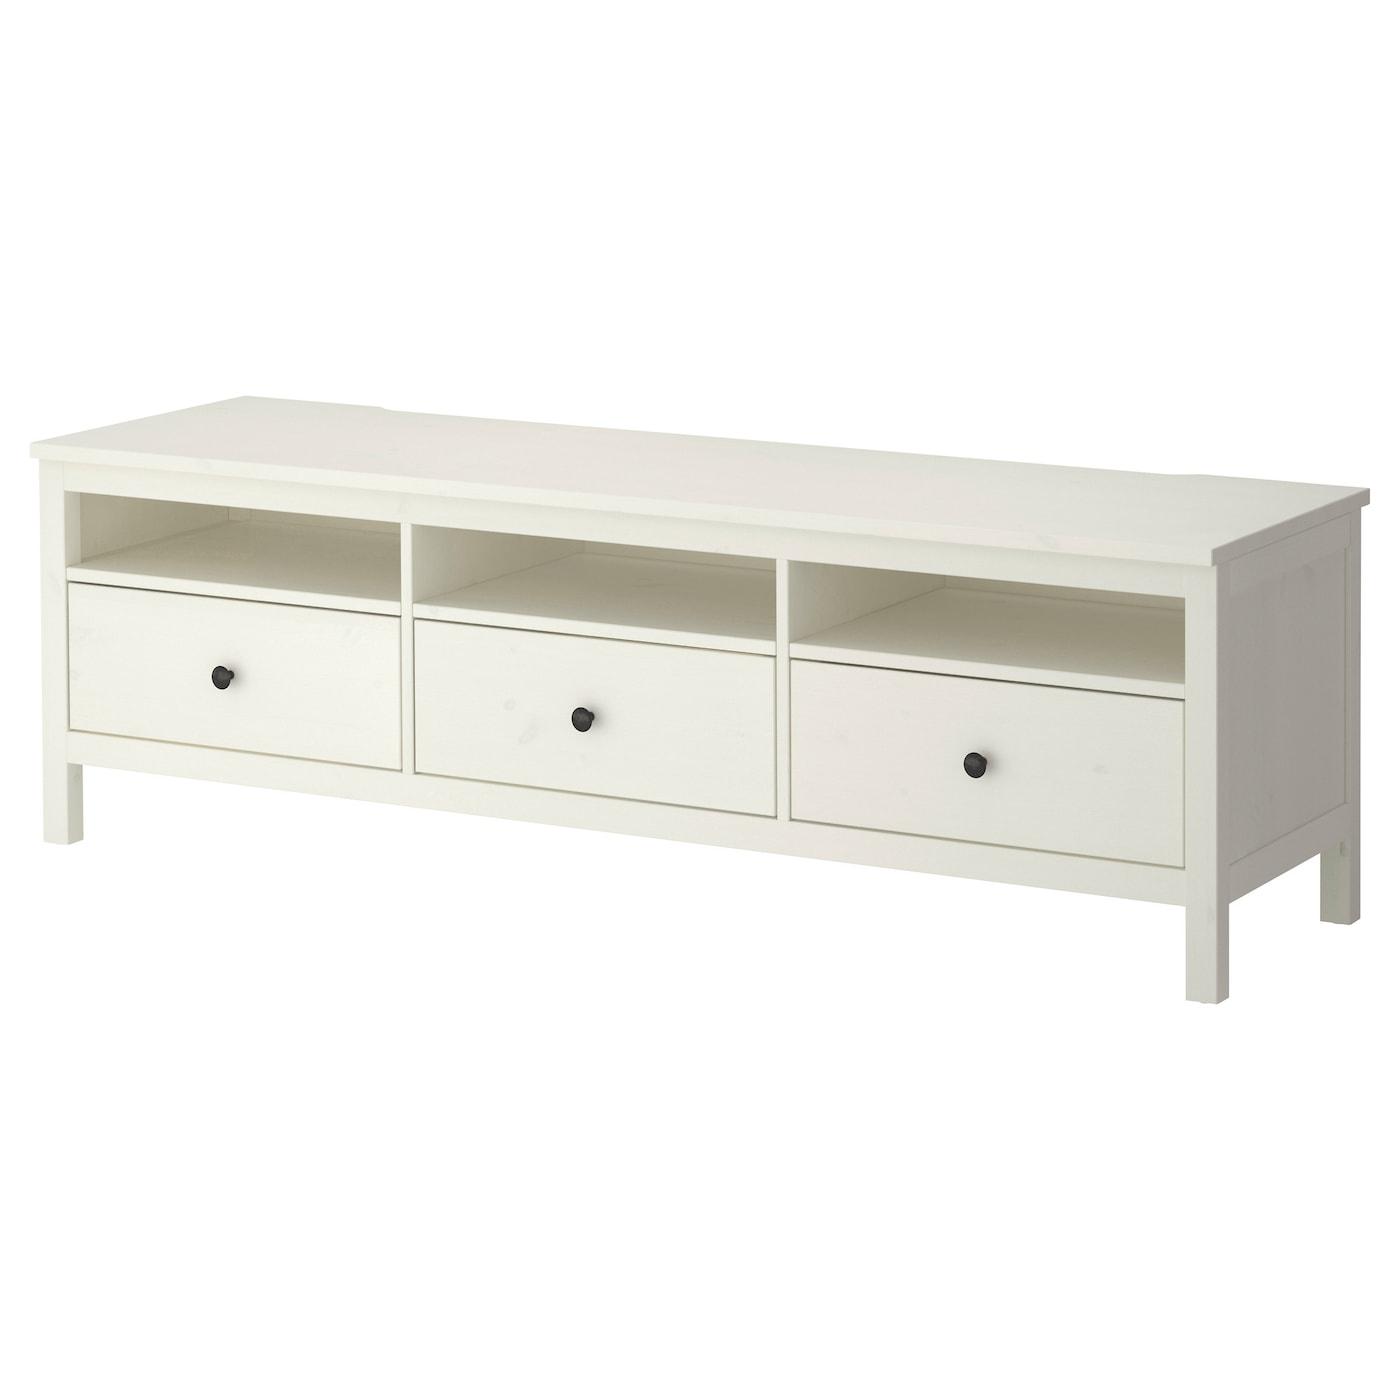 HEMNES TV bench White stain 183x47 cm IKEA